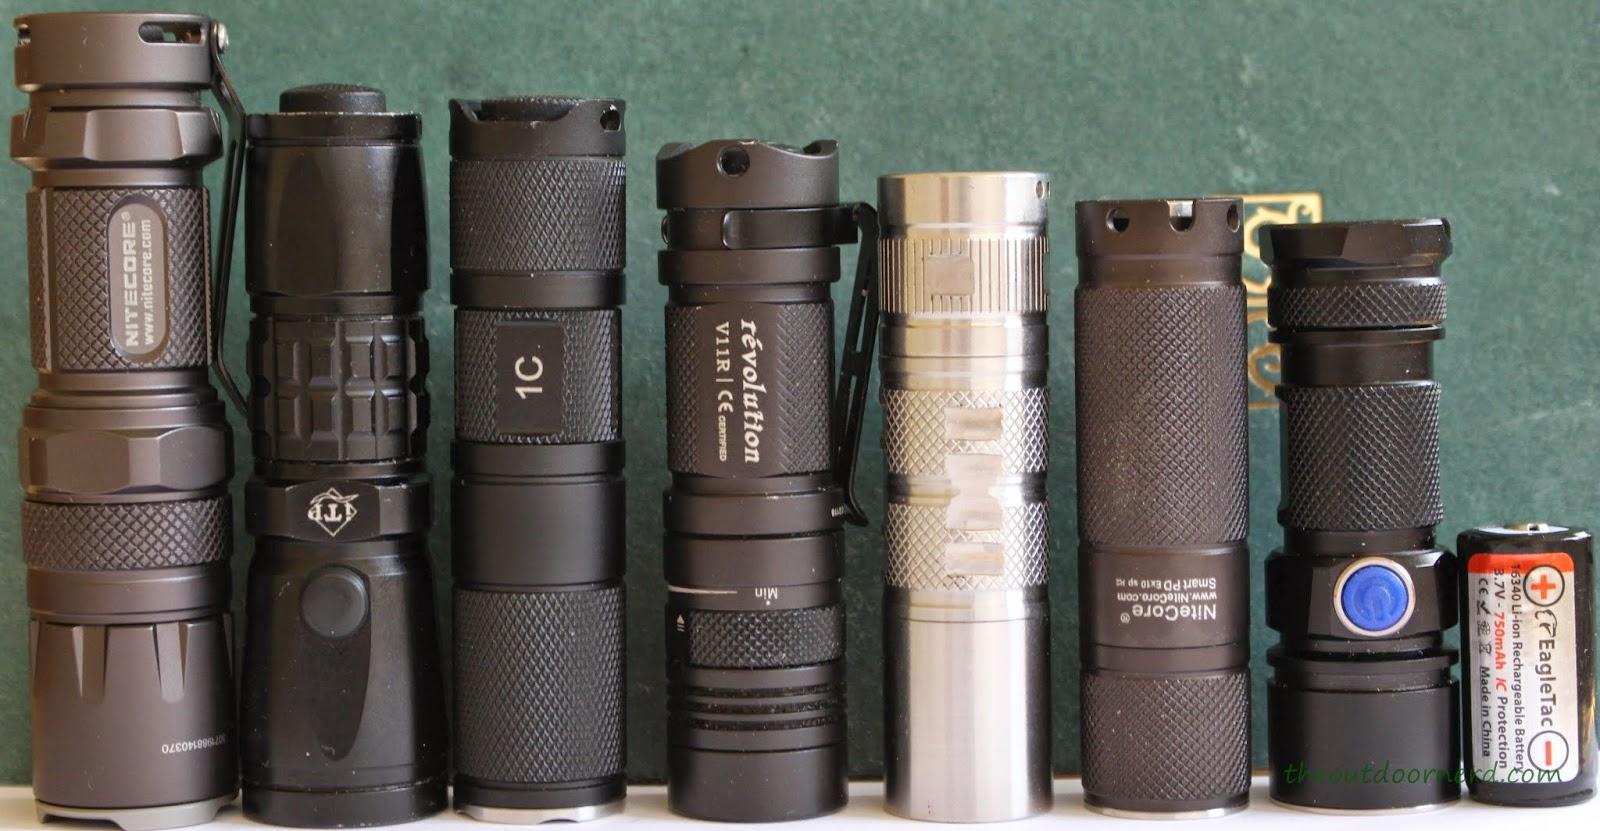 Nitecore Ex10 1xCR123A Flashlight and EDC Friends